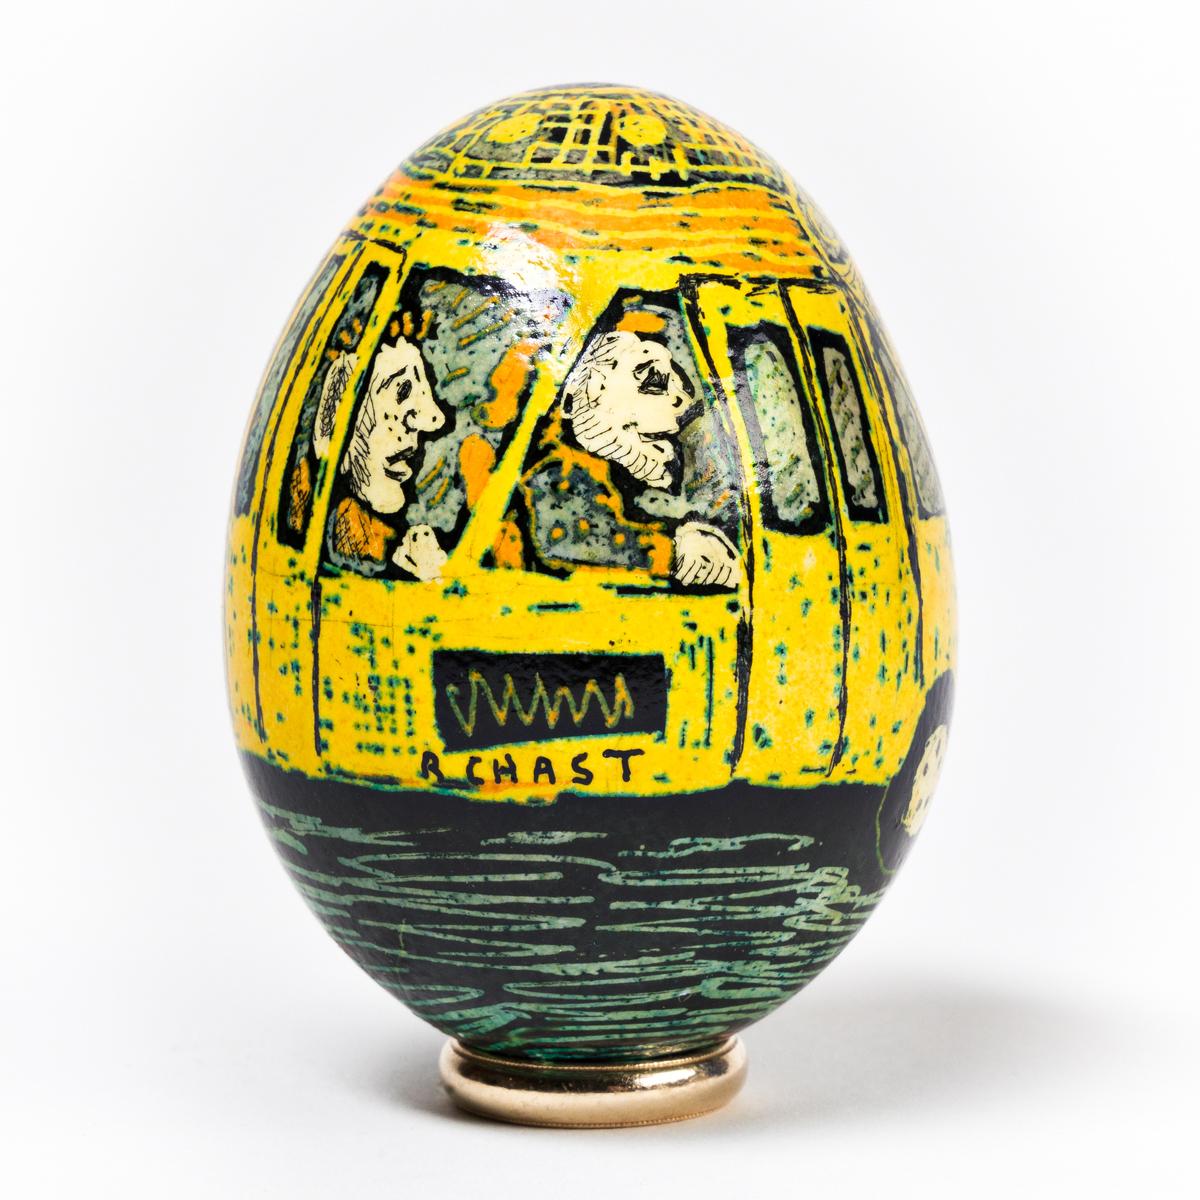 ROZ CHAST (1955- ) New York City Bus. [CARTOONS / NEW YORKER CARTOONIST / PYSANKA EGG]